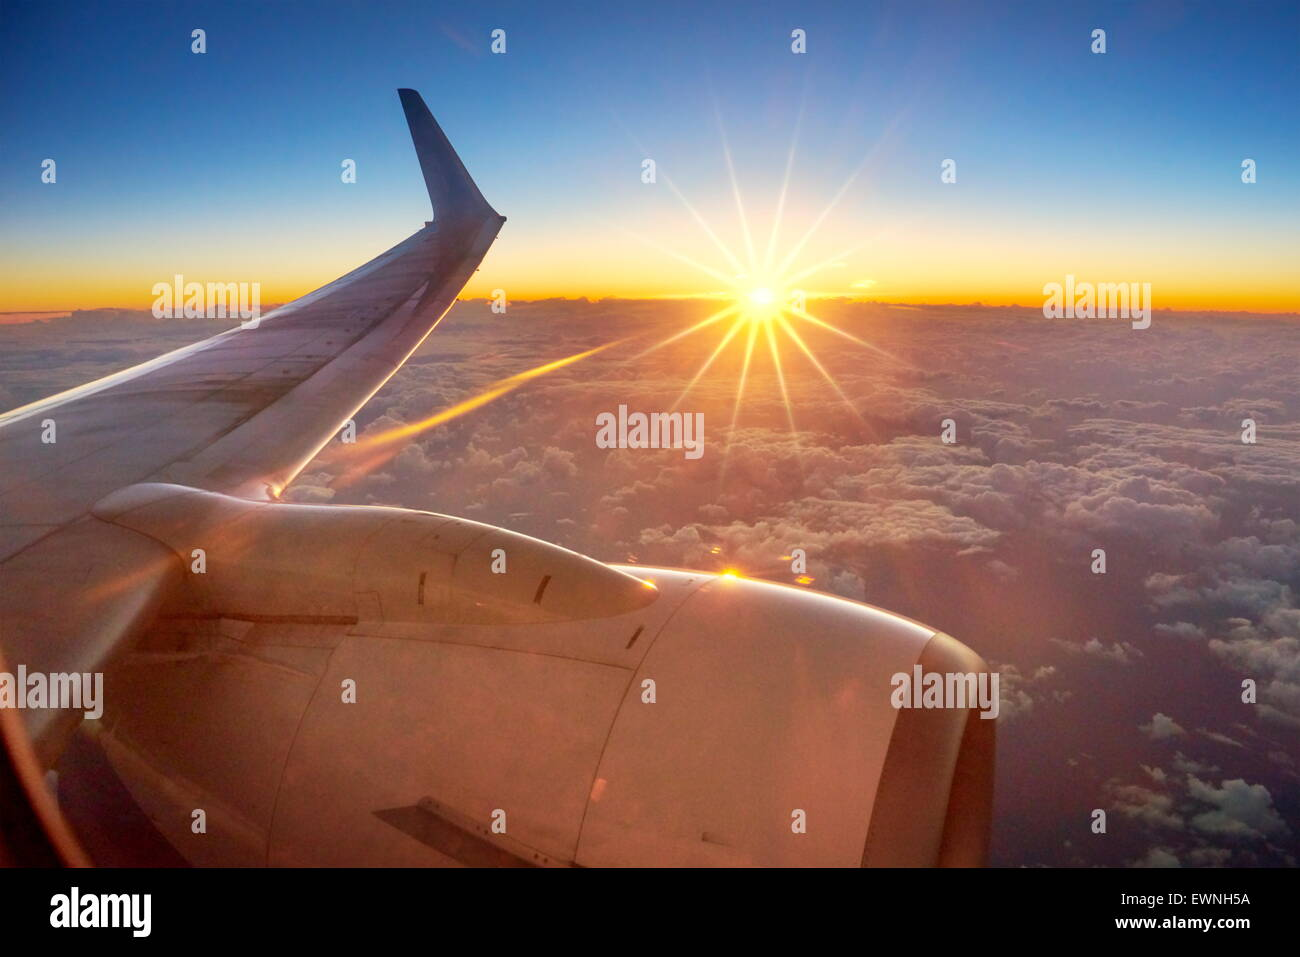 Sunrise view from airplane window Stock Photo